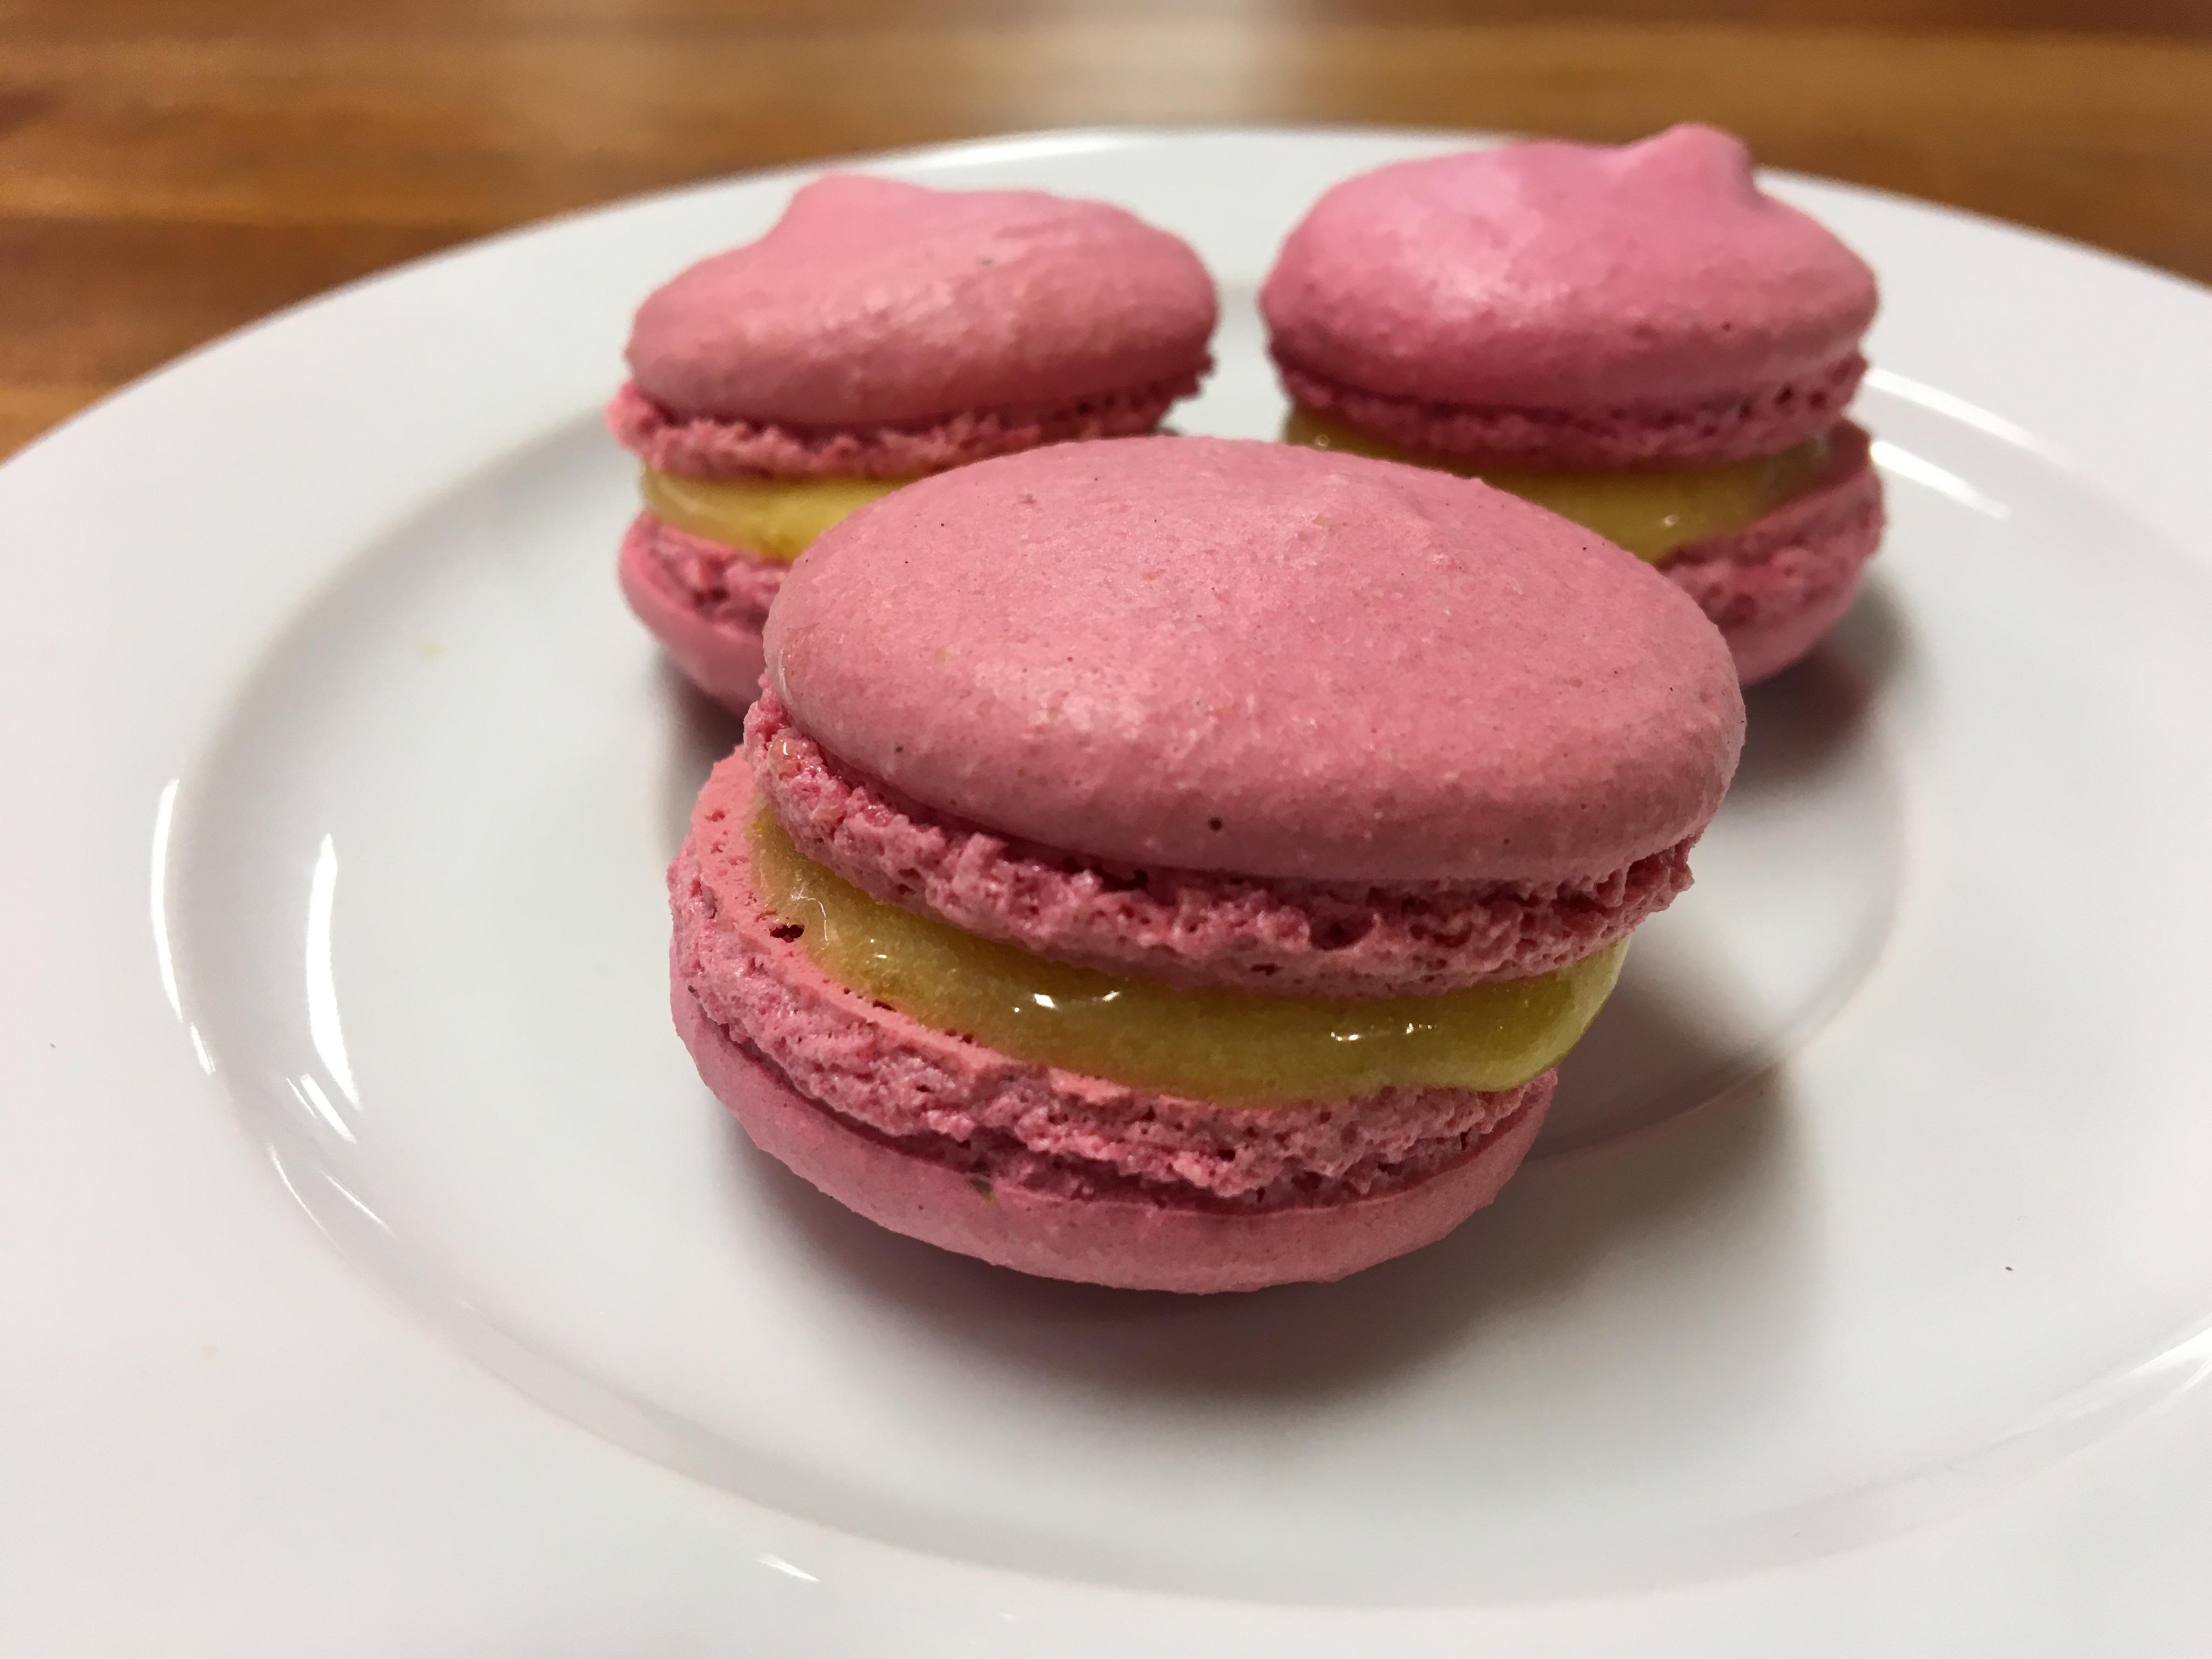 French Macaron With Jolanta – Lemon Curd